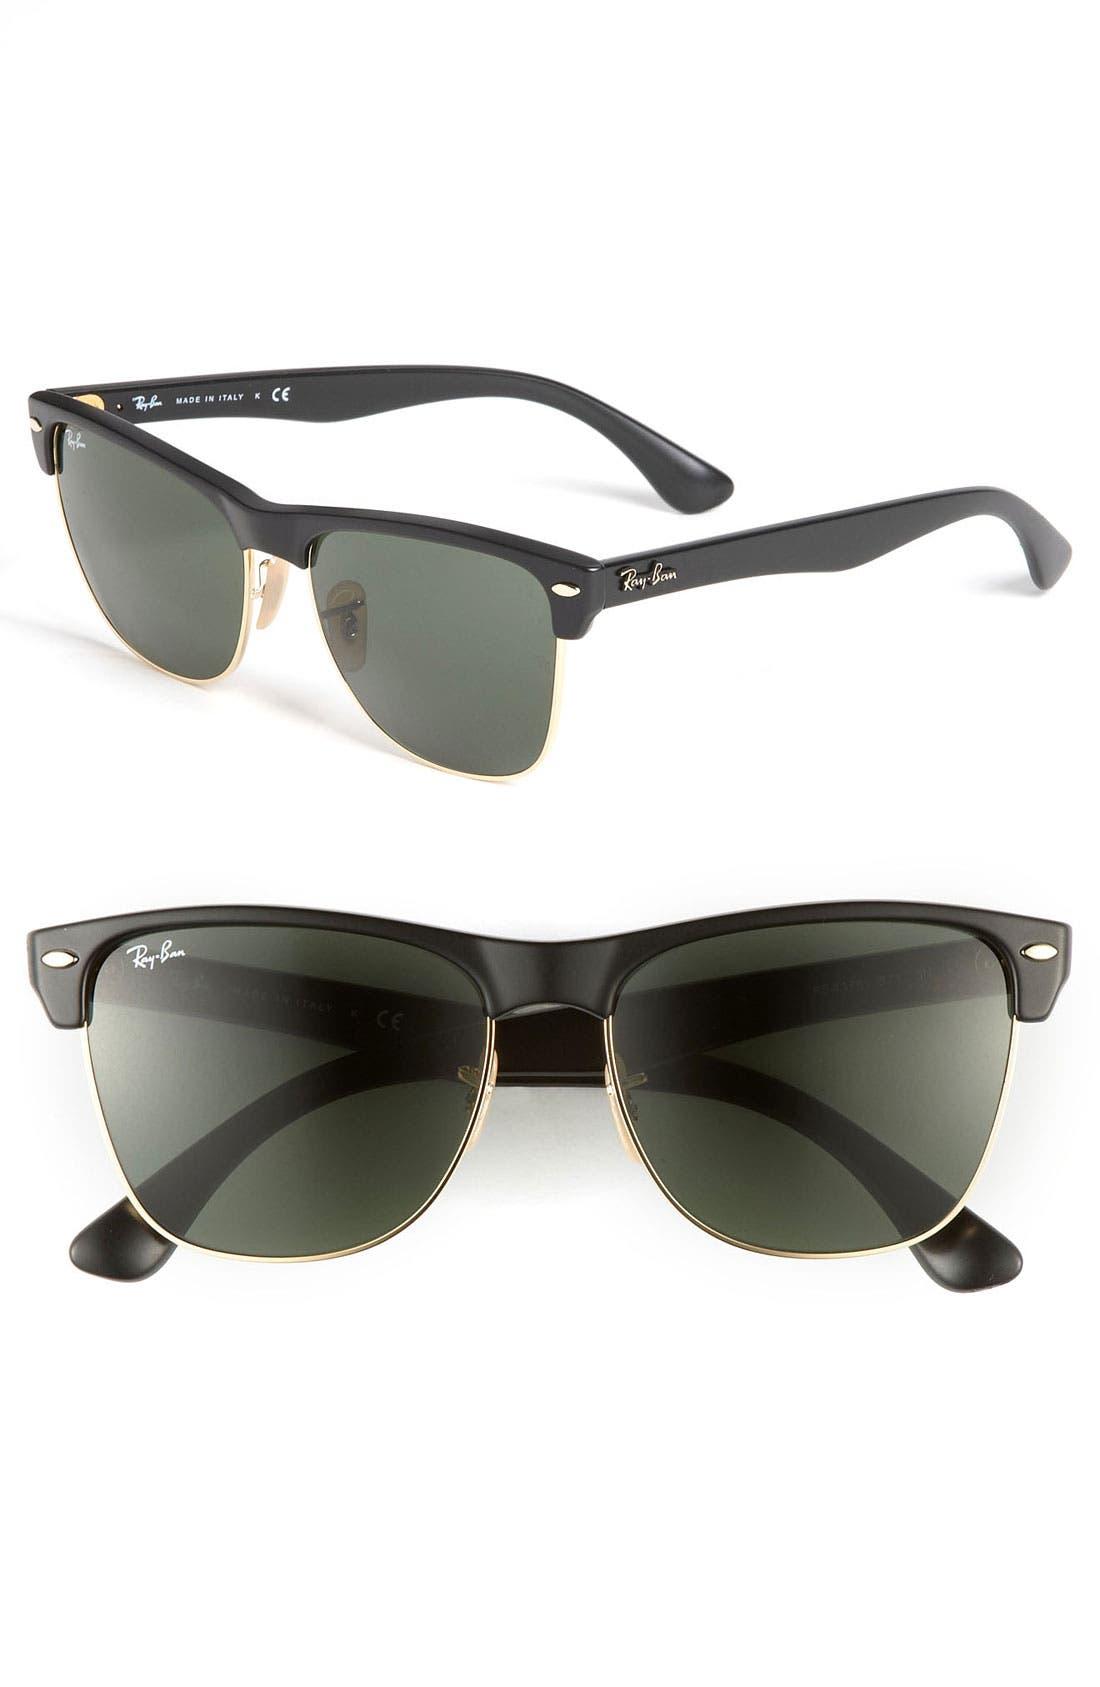 Ray-Ban Highstreet 57mm Sunglasses